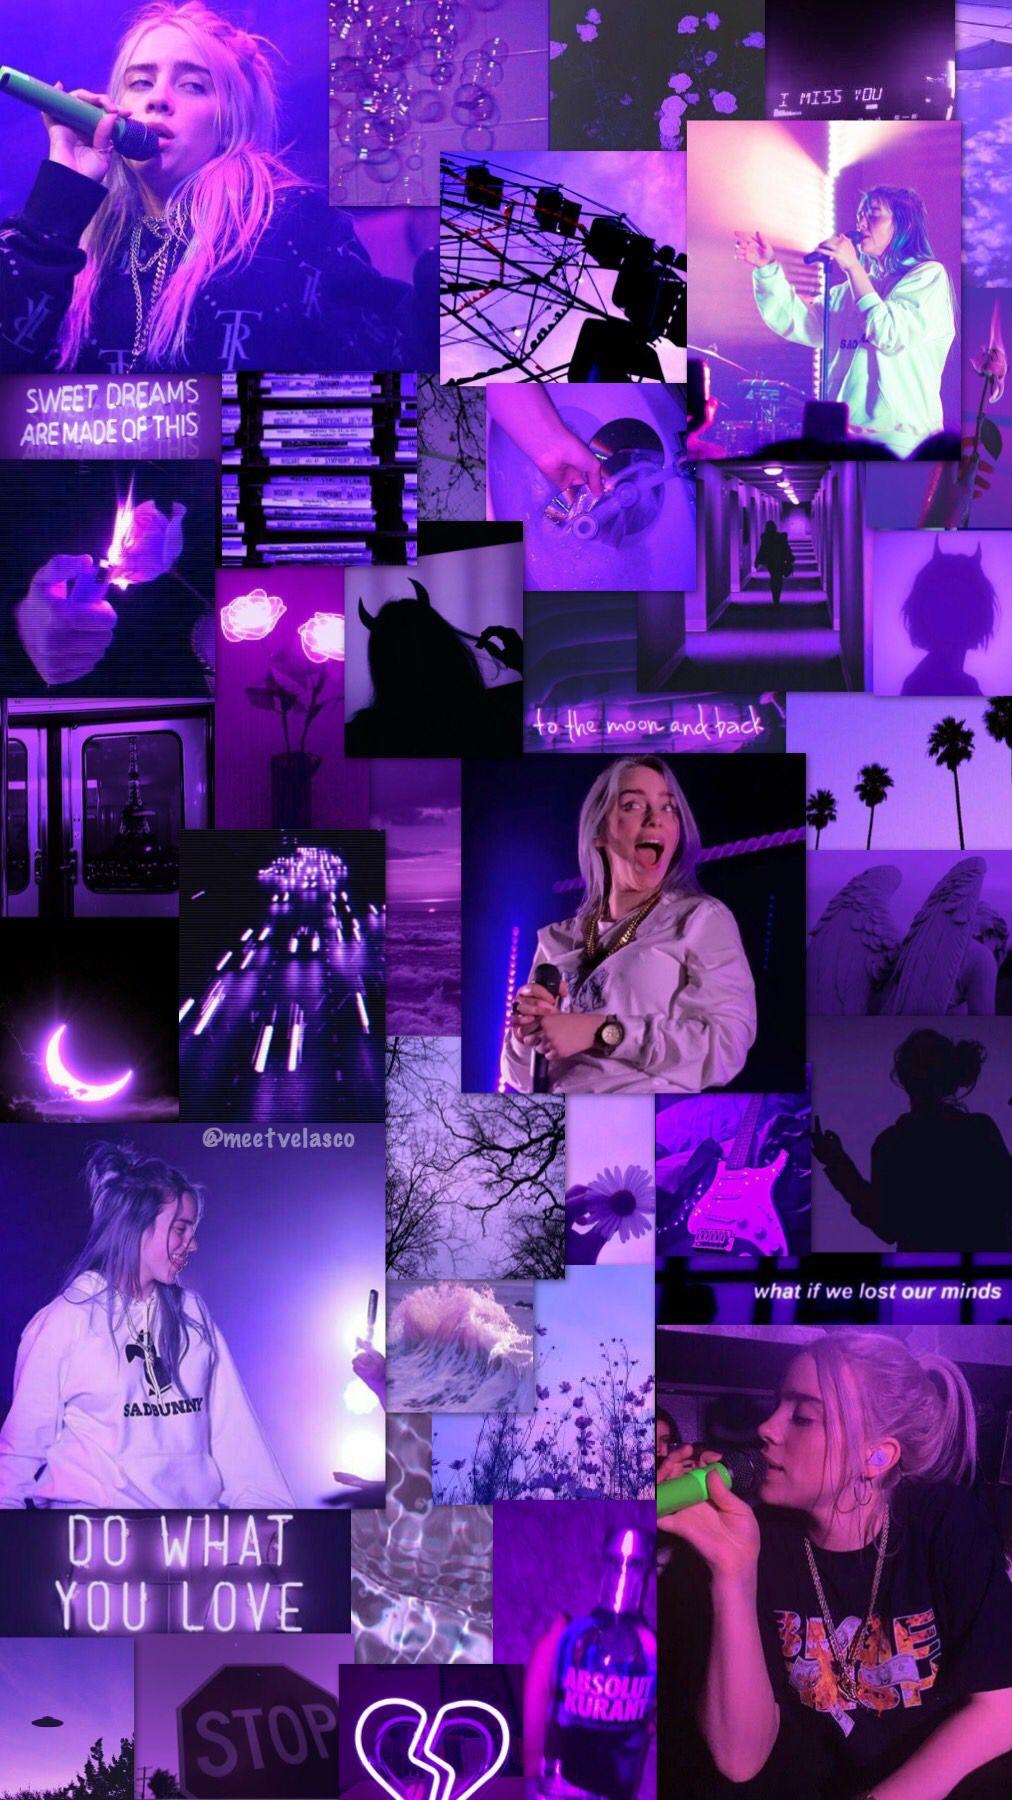 Billie Eilish Lockscreen Wallpaper Fondo Bad Girl Wallpaper Billie Cute Wallpapers